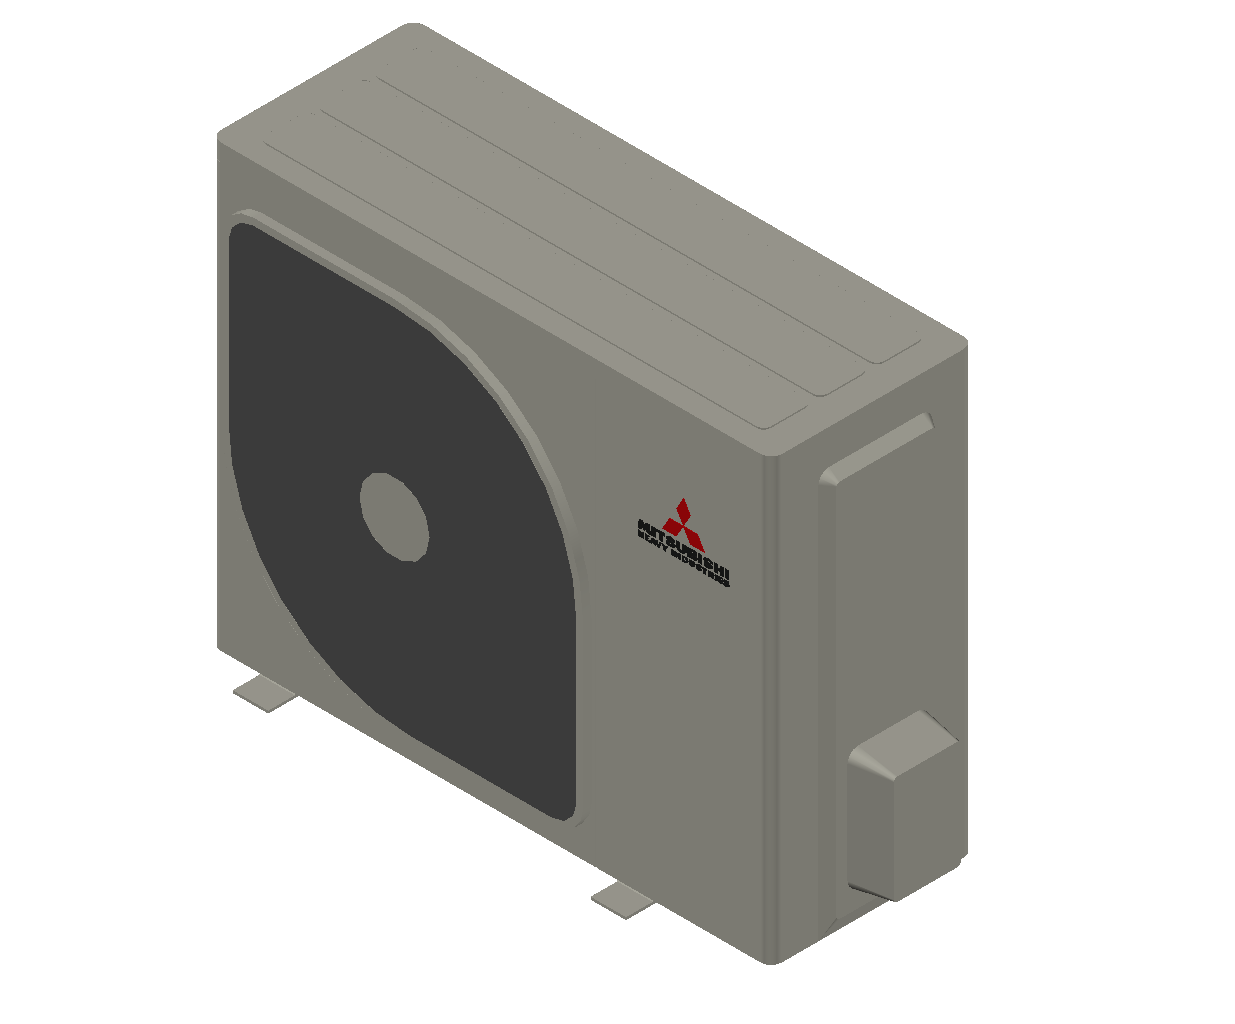 HC_Heat Pump_MEPcontent_Mitsubishi Heavy Industries_PAC-RAC_SRC40ZSX-W1_INT-EN.dwg